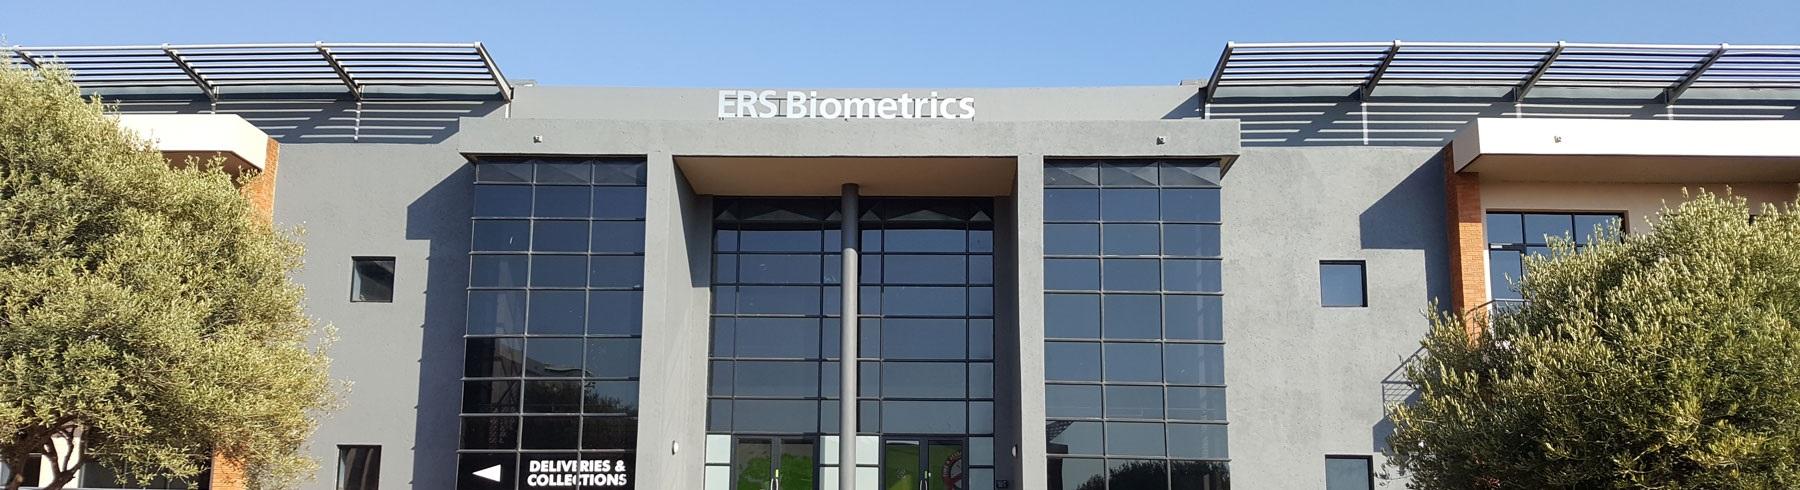 ERS Biometrics H/O